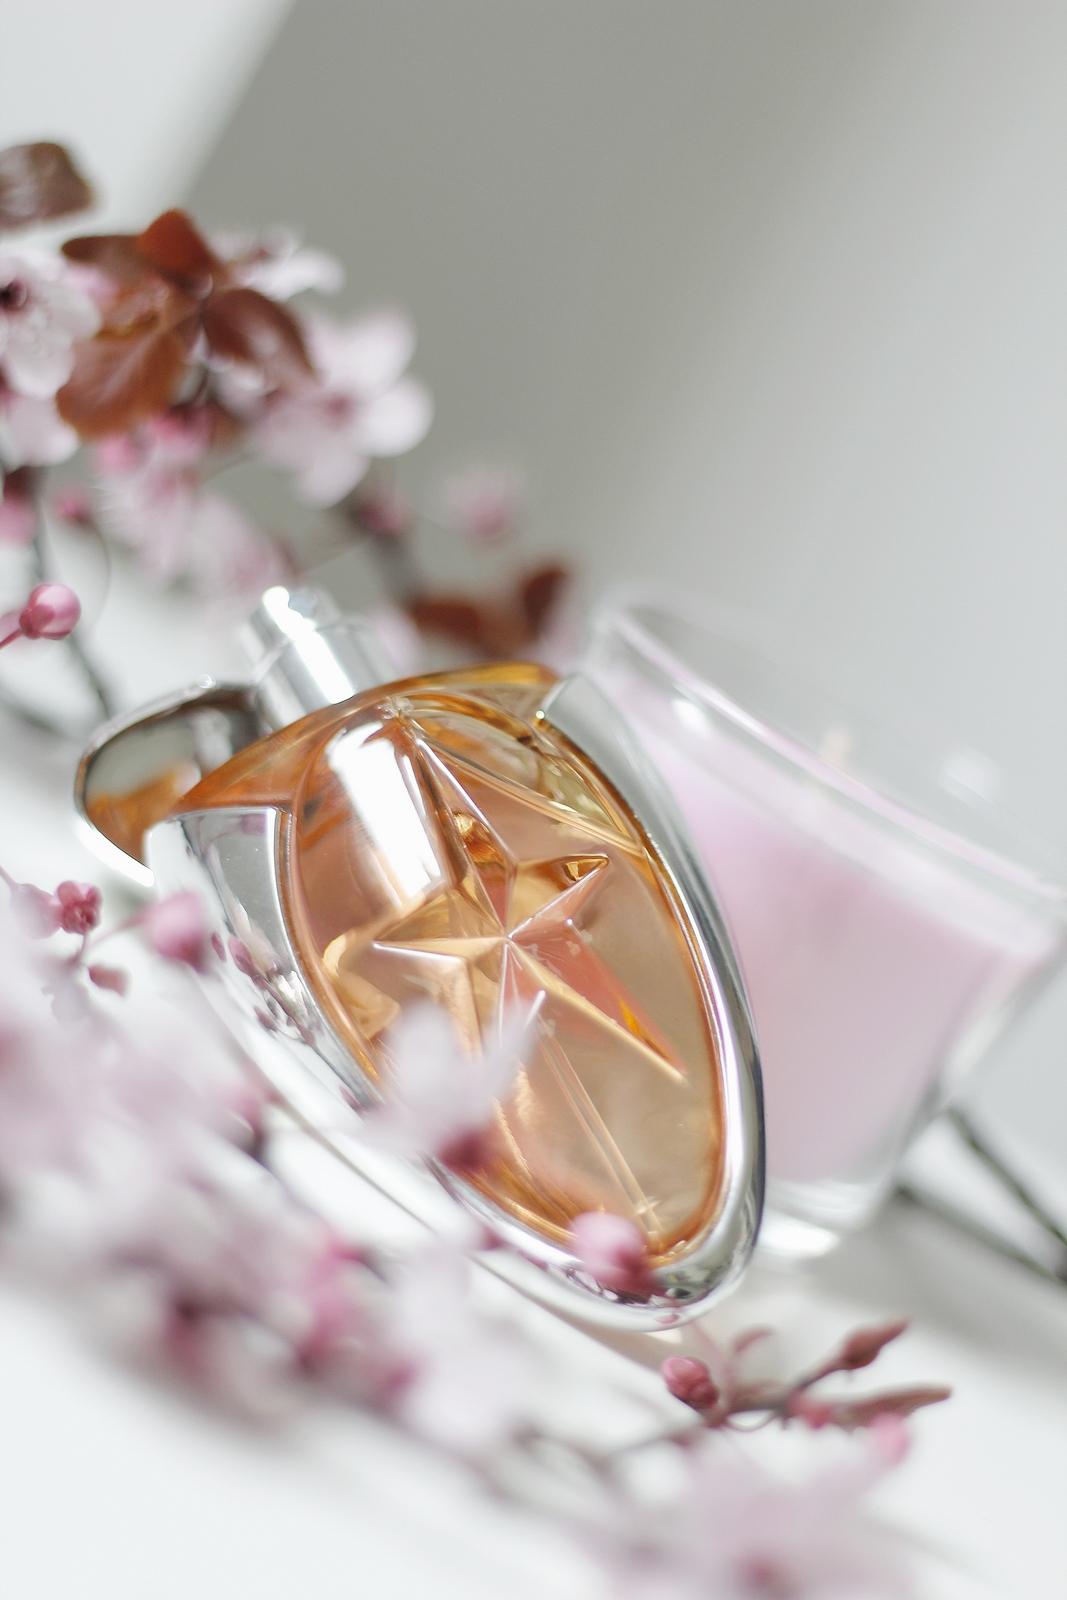 parfums femme - angel muse - thierry mugler - nouveau